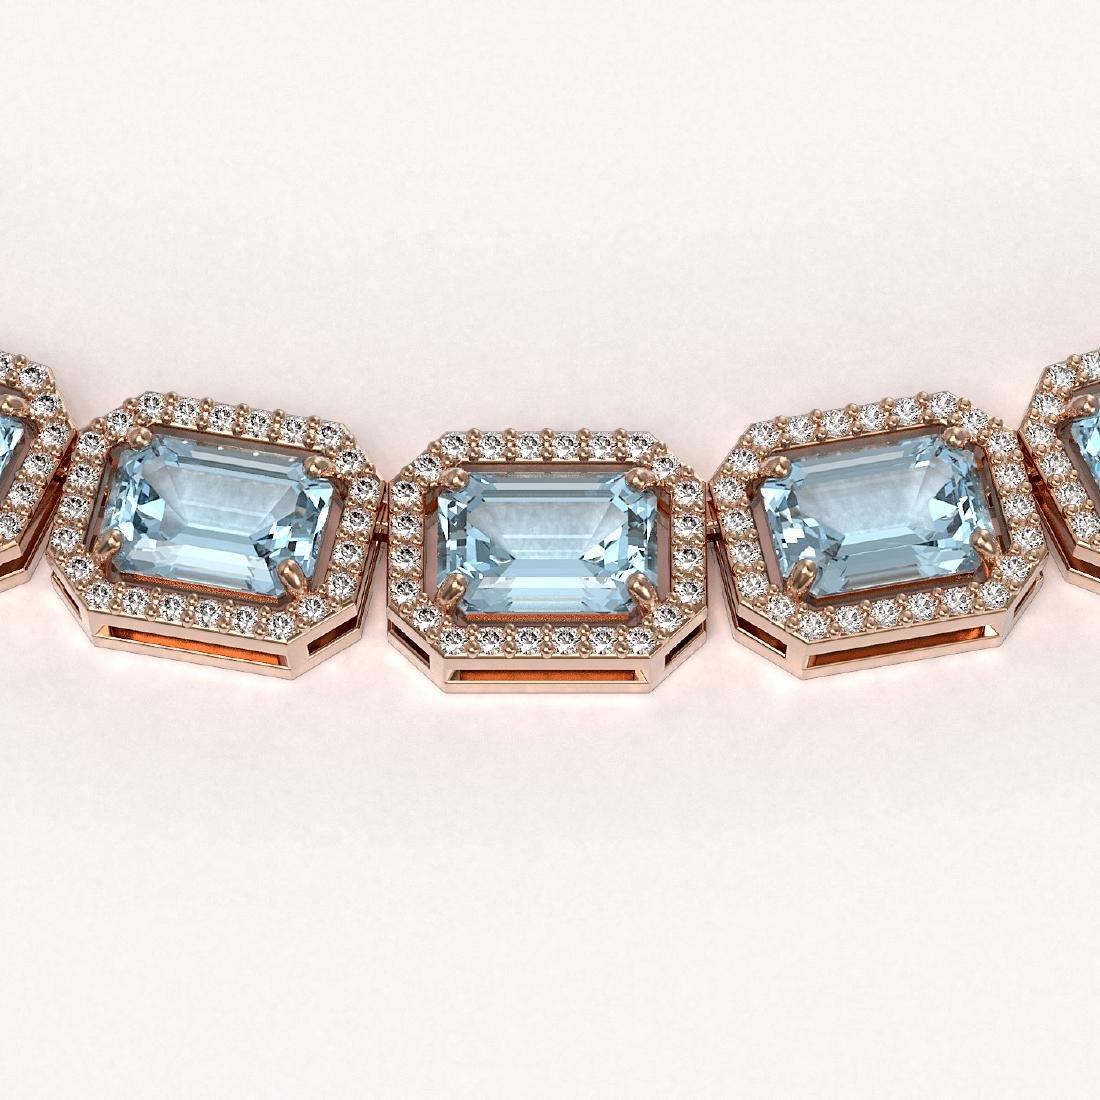 54.79 CTW Aquamarine & Diamond Halo Necklace 10K Rose - 3